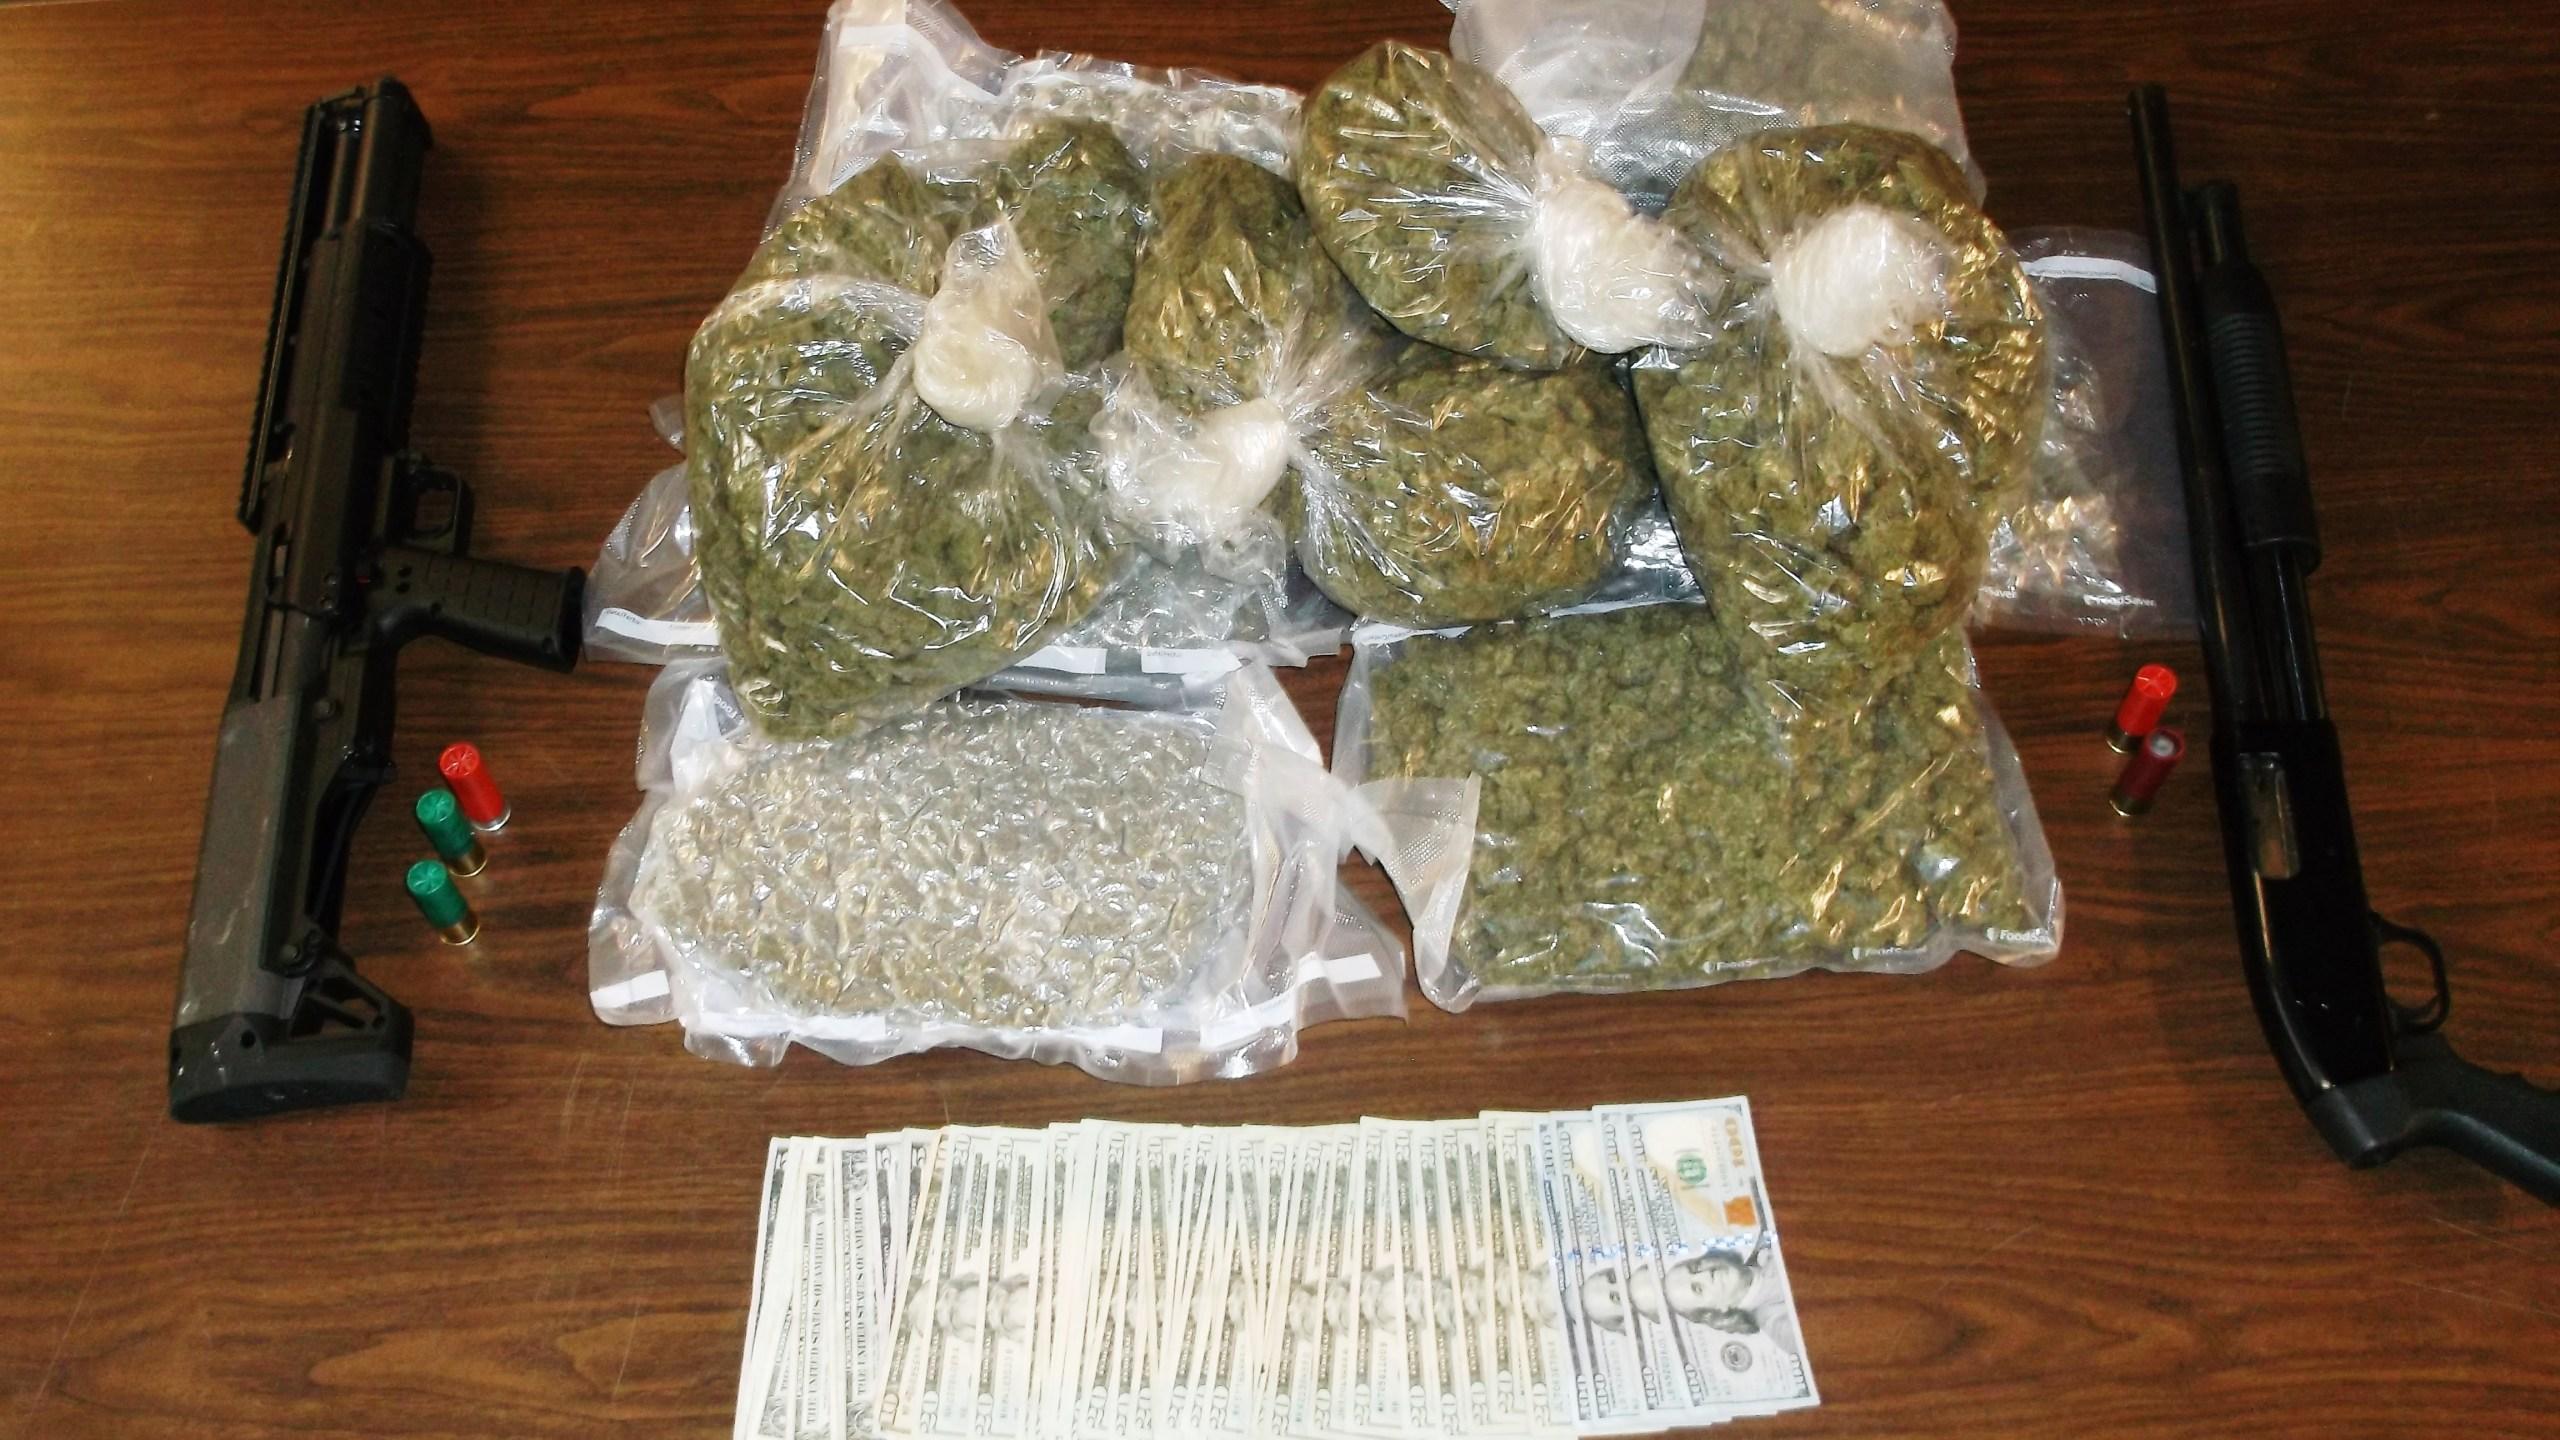 Drug Bust in Pine Bluff_1542748001056.JPG.jpg